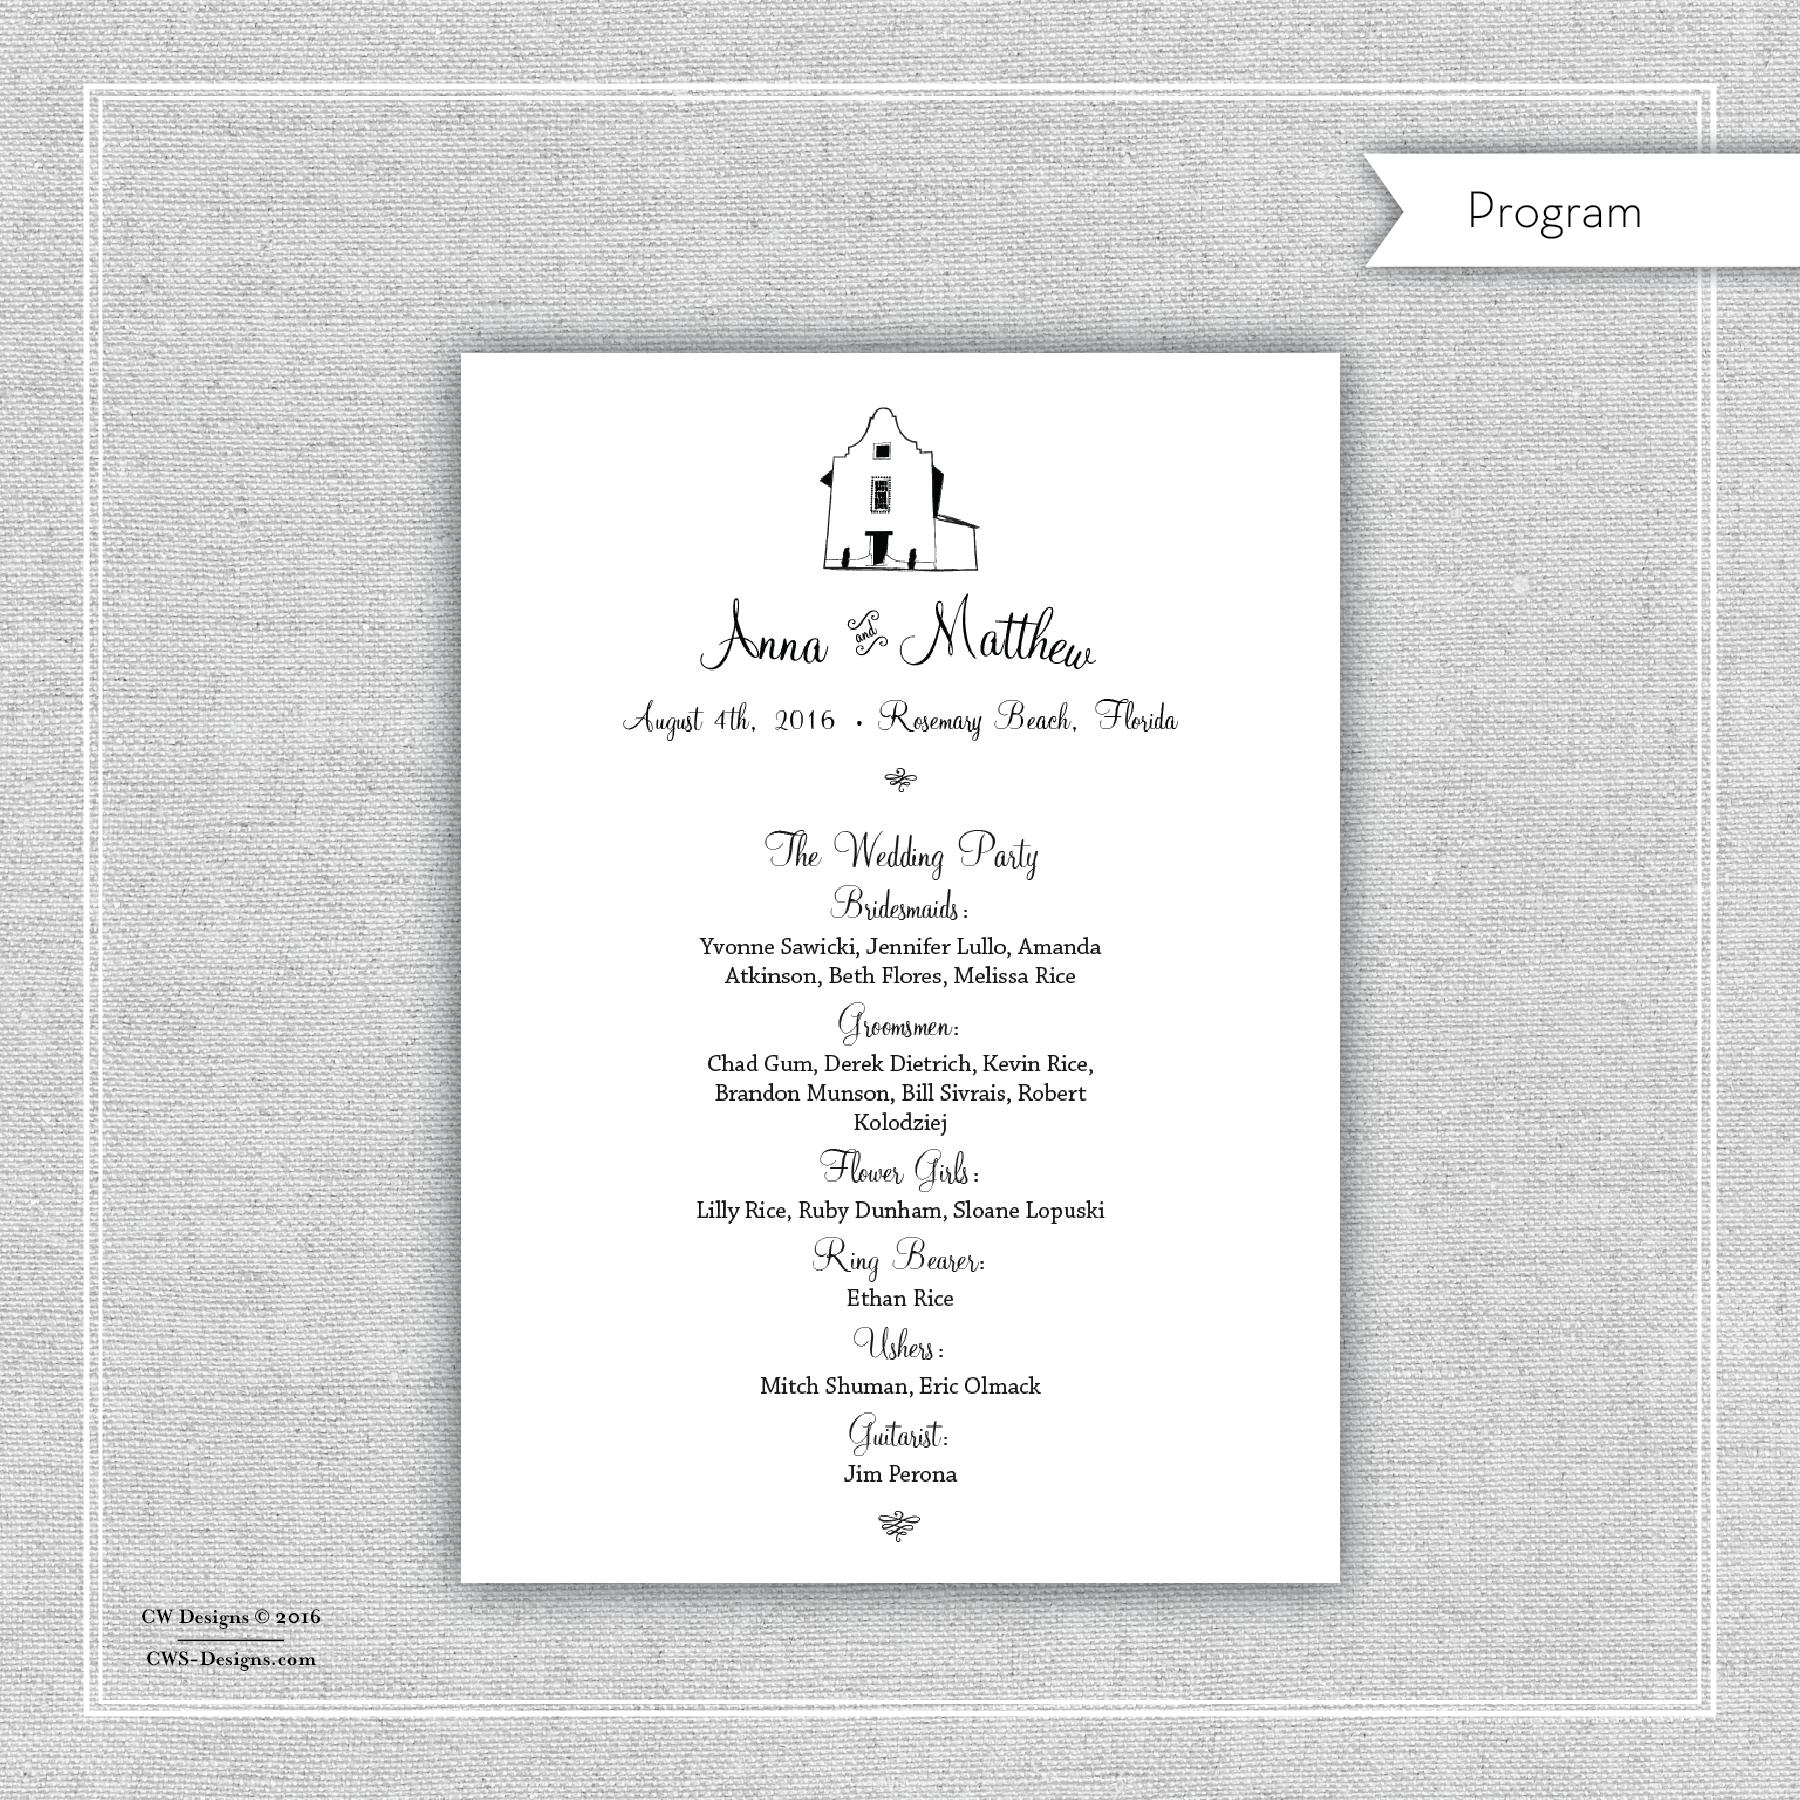 Program Linen Background Etsy Listings-01.png